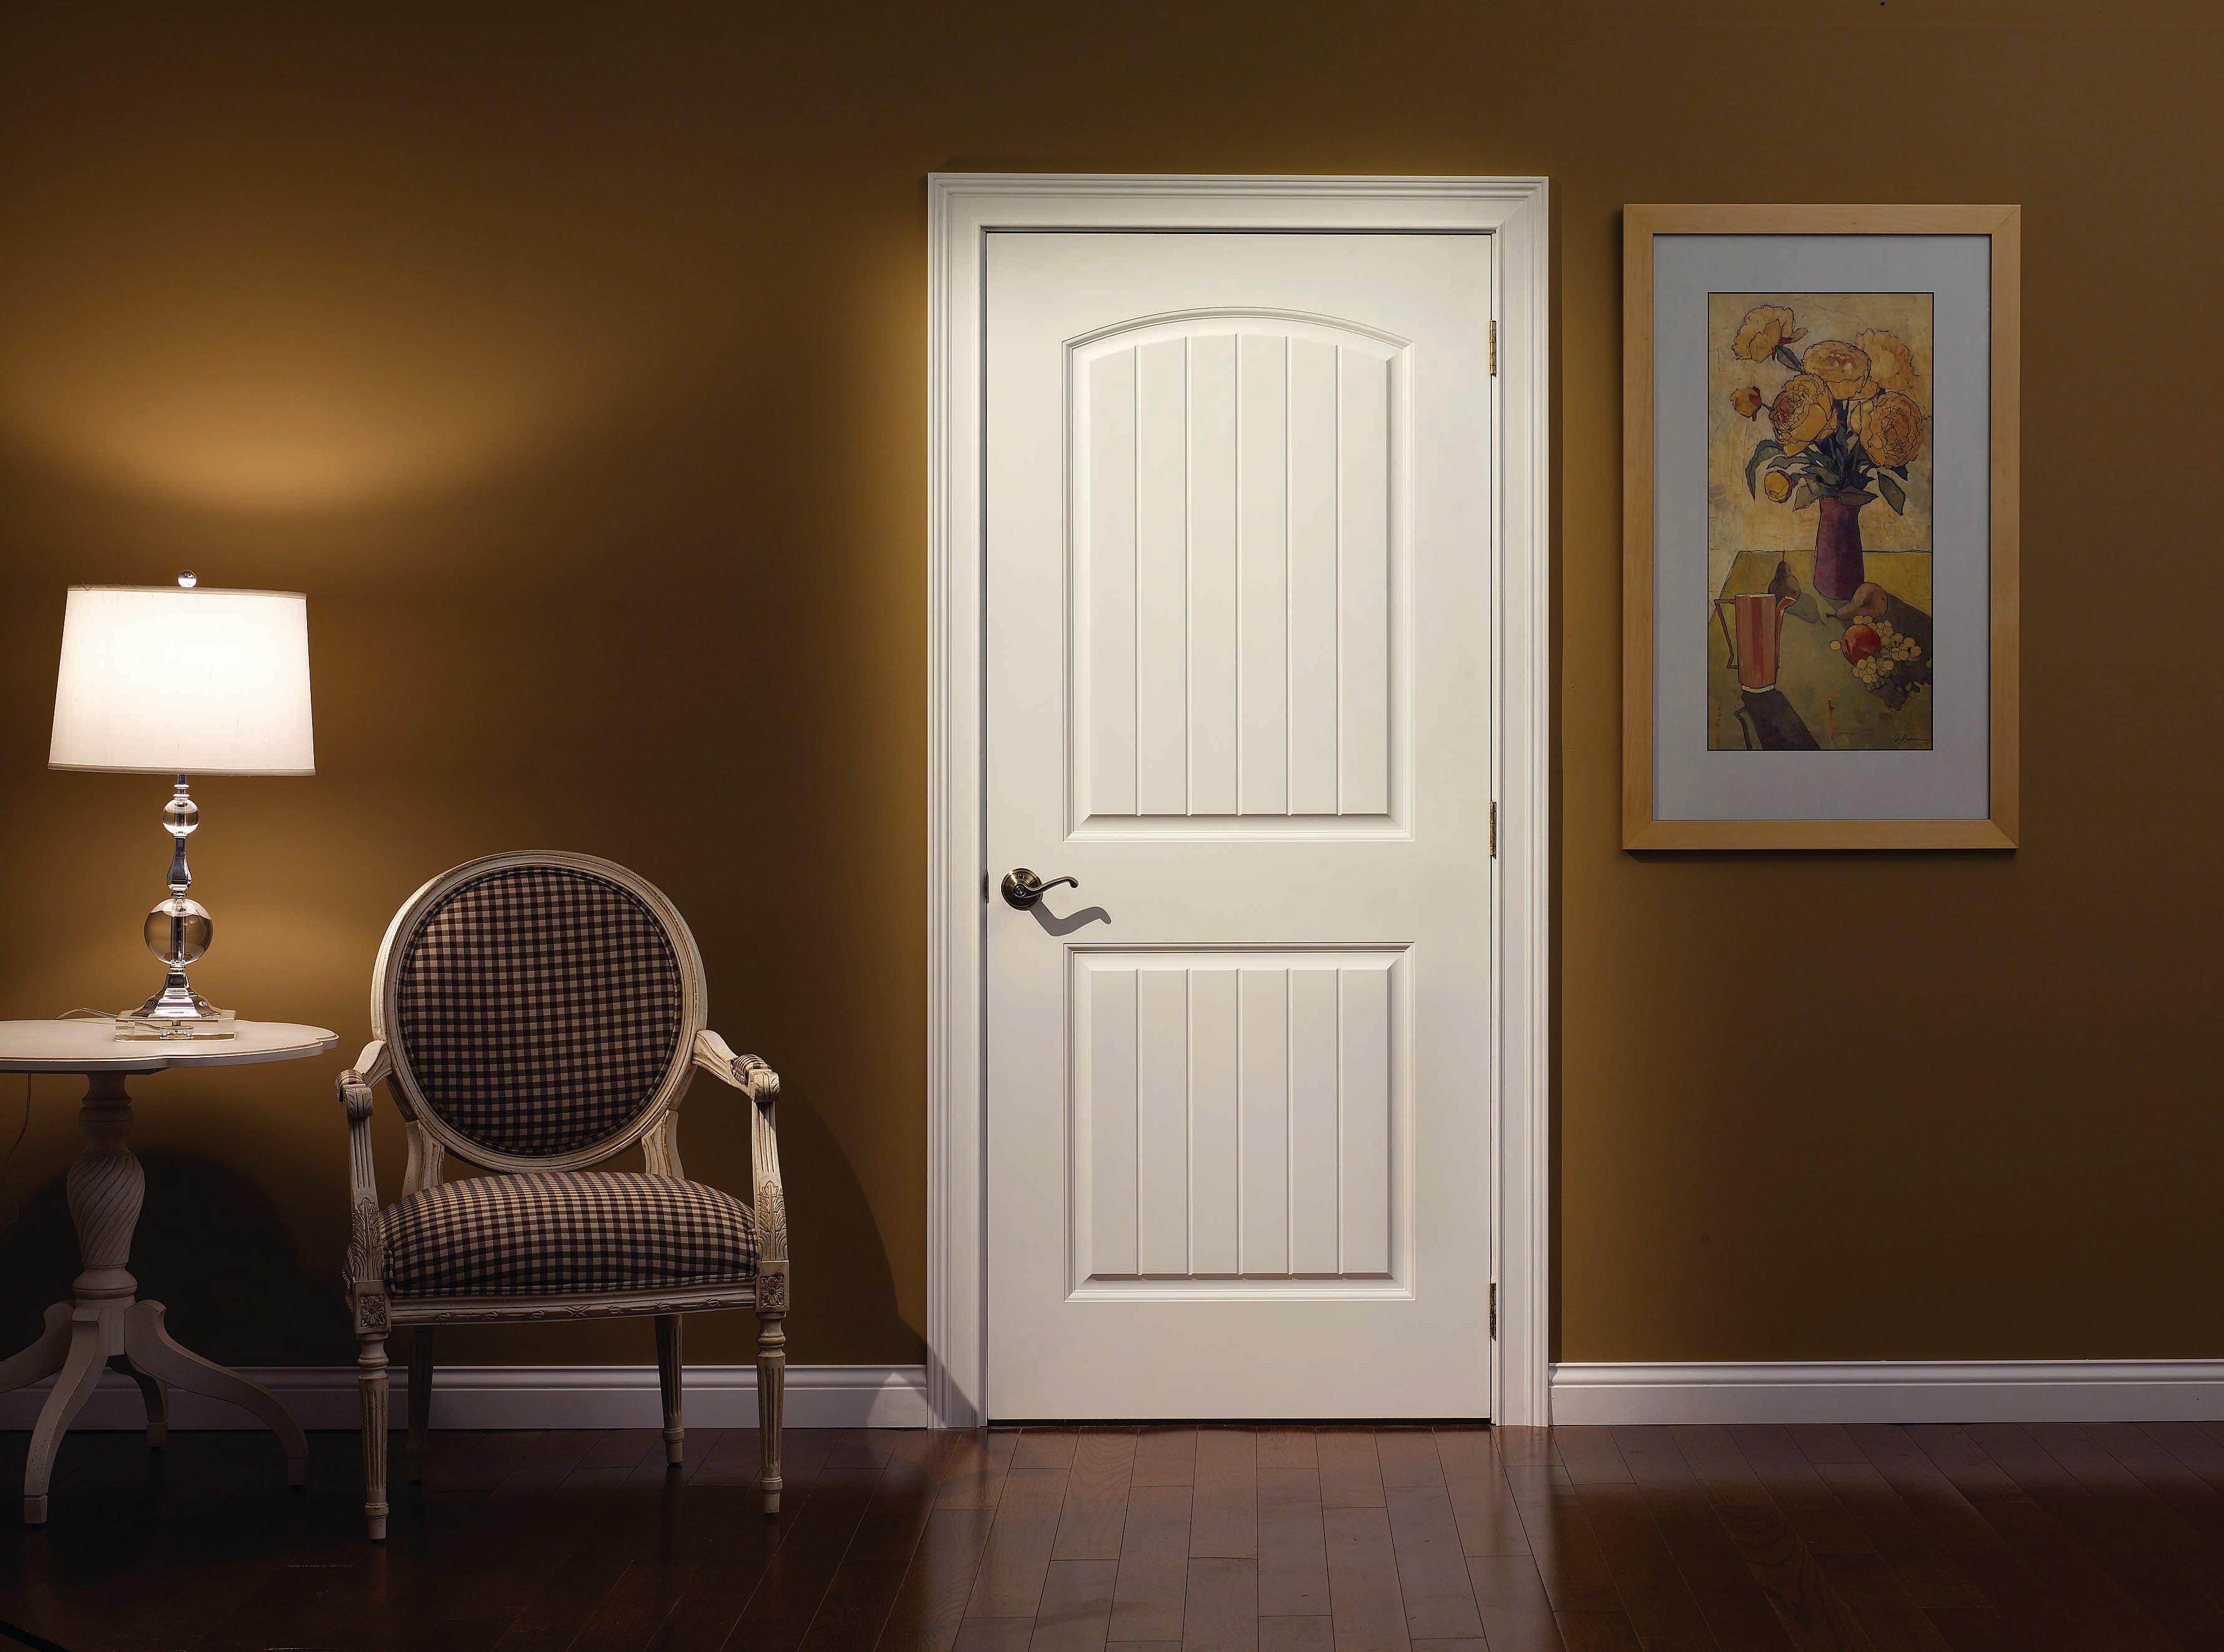 CMI CraftMaster Green Doors | Remodeling | Doors Interiors Green Products Salvaged Materials Renewable Materials Sustainable Materials Green Materials ... & CMI CraftMaster Green Doors | Remodeling | Doors Interiors Green ...